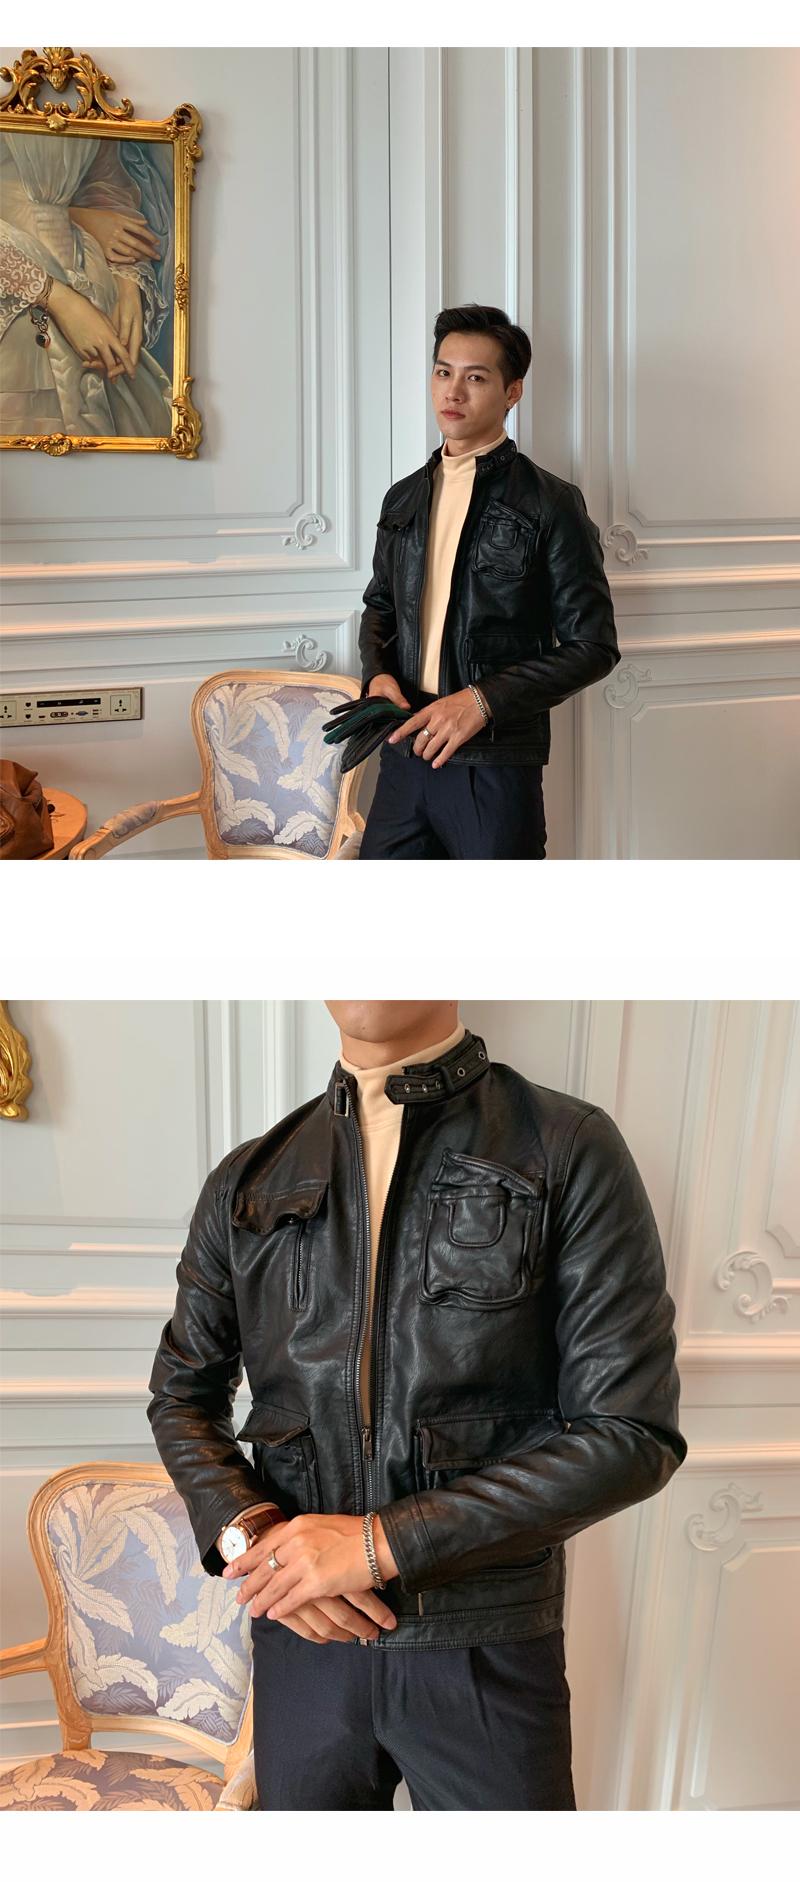 South Korea Korean version handsome collar leather jacket men's retro personality PU leather clothing fashion 100 locomotive leather fashion tide 45 Online shopping Bangladesh